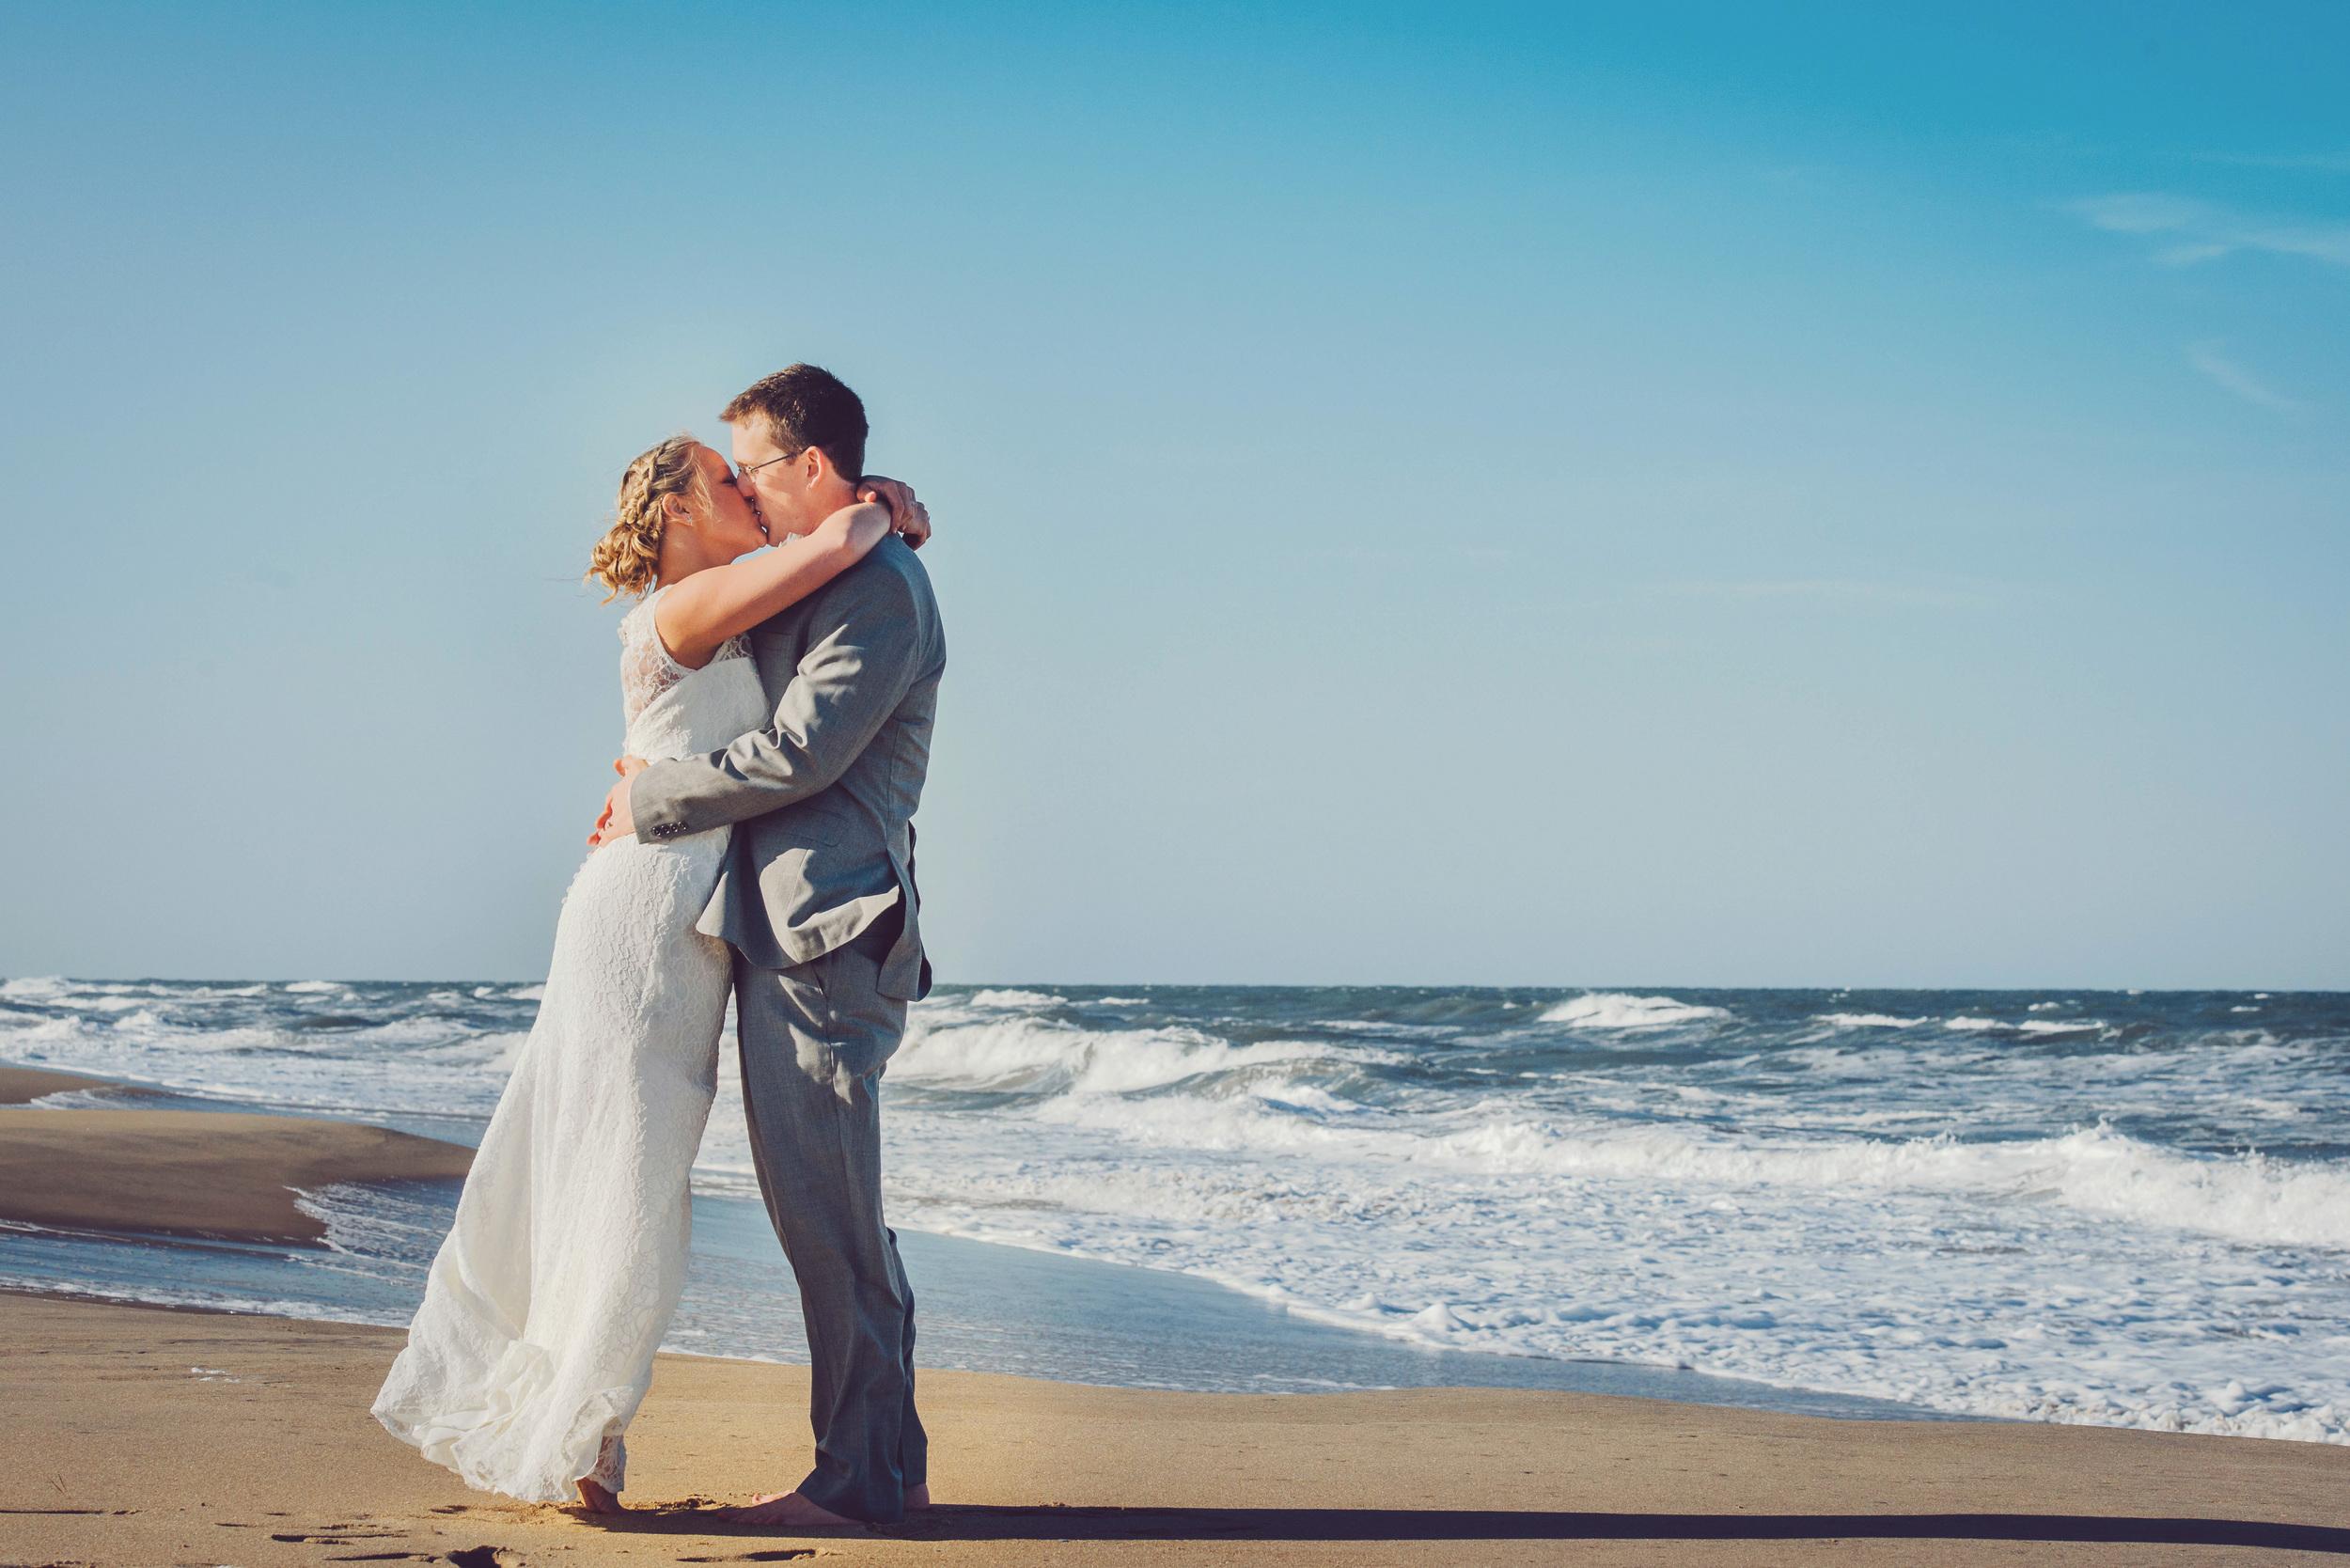 sandbridge-wedding-photographers-beach-wedding-virginia-beach-wedding-photographers-norfolk-wedding-photographers-bride-and-groom-on-the-beach-melissa-bliss-photography